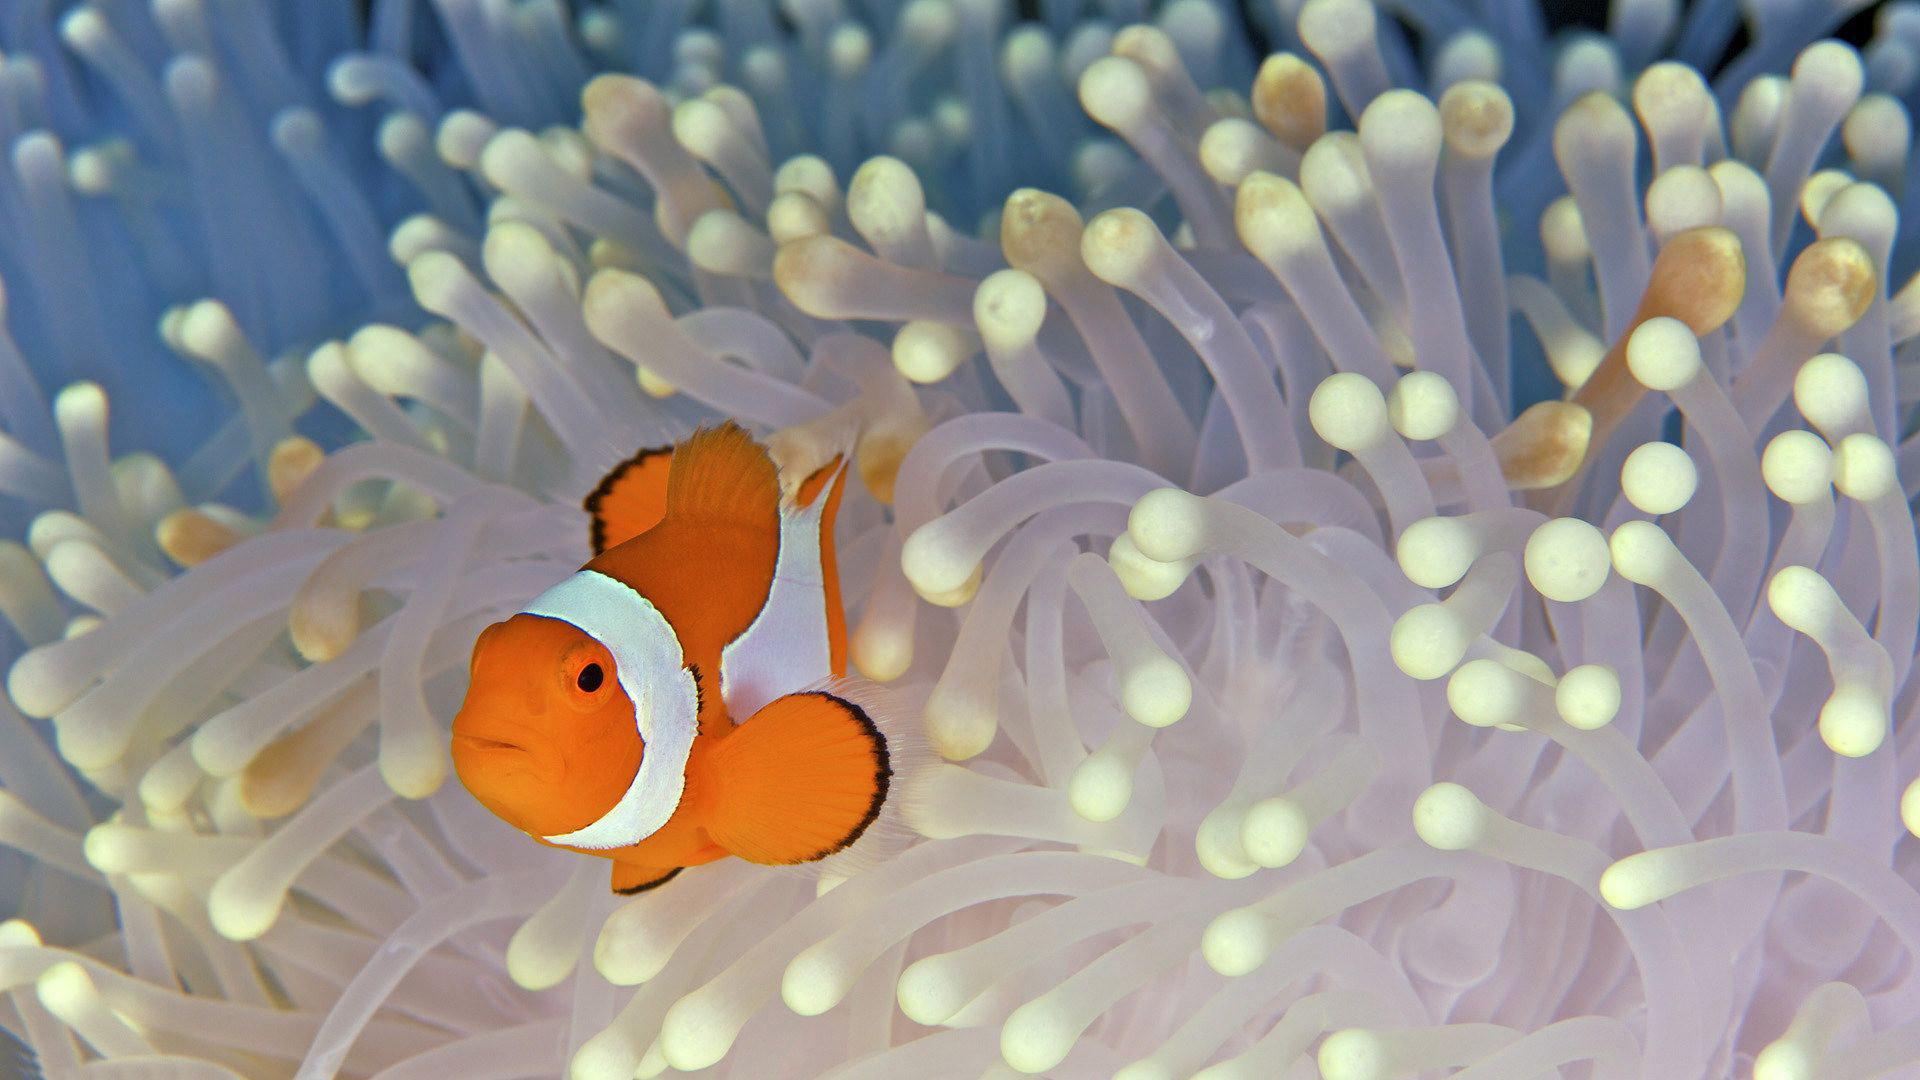 Iphone 5 Clown Fish Wallpaper Clown Fish Wallpaper 61 Pictures